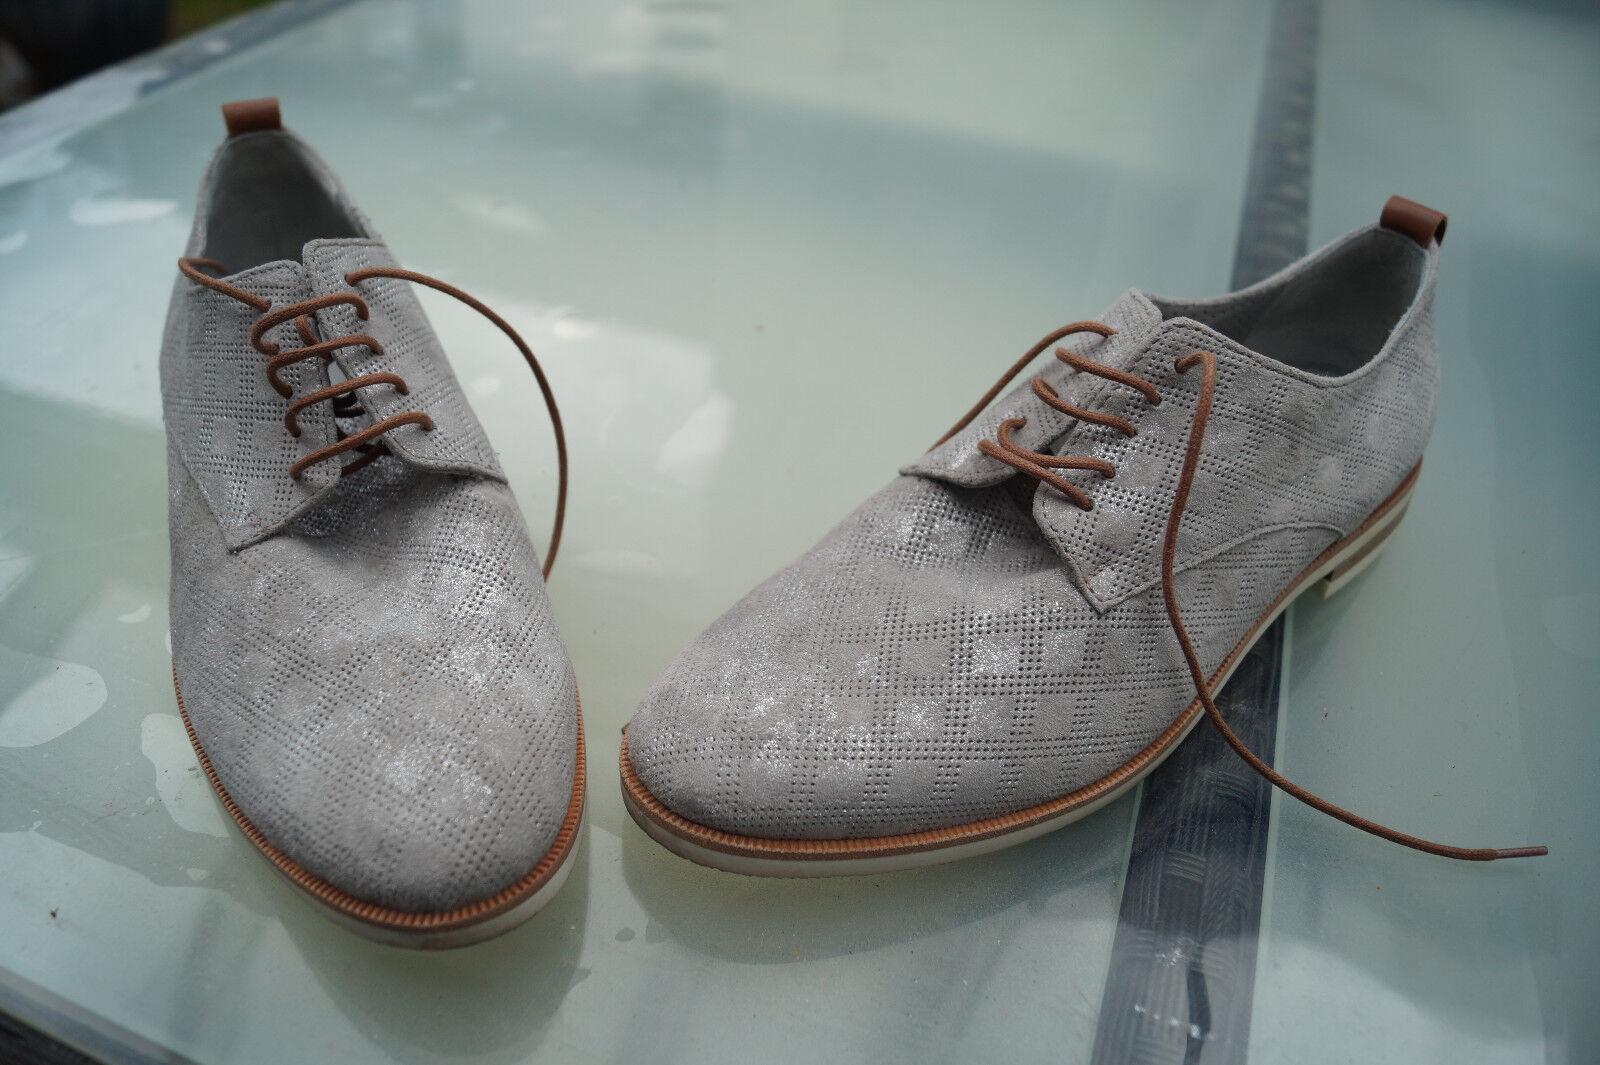 edle MARIPE Damen Schuhe Scnürschuhe Leder Luxus Gr.37,5 silber grau wie Neu #89